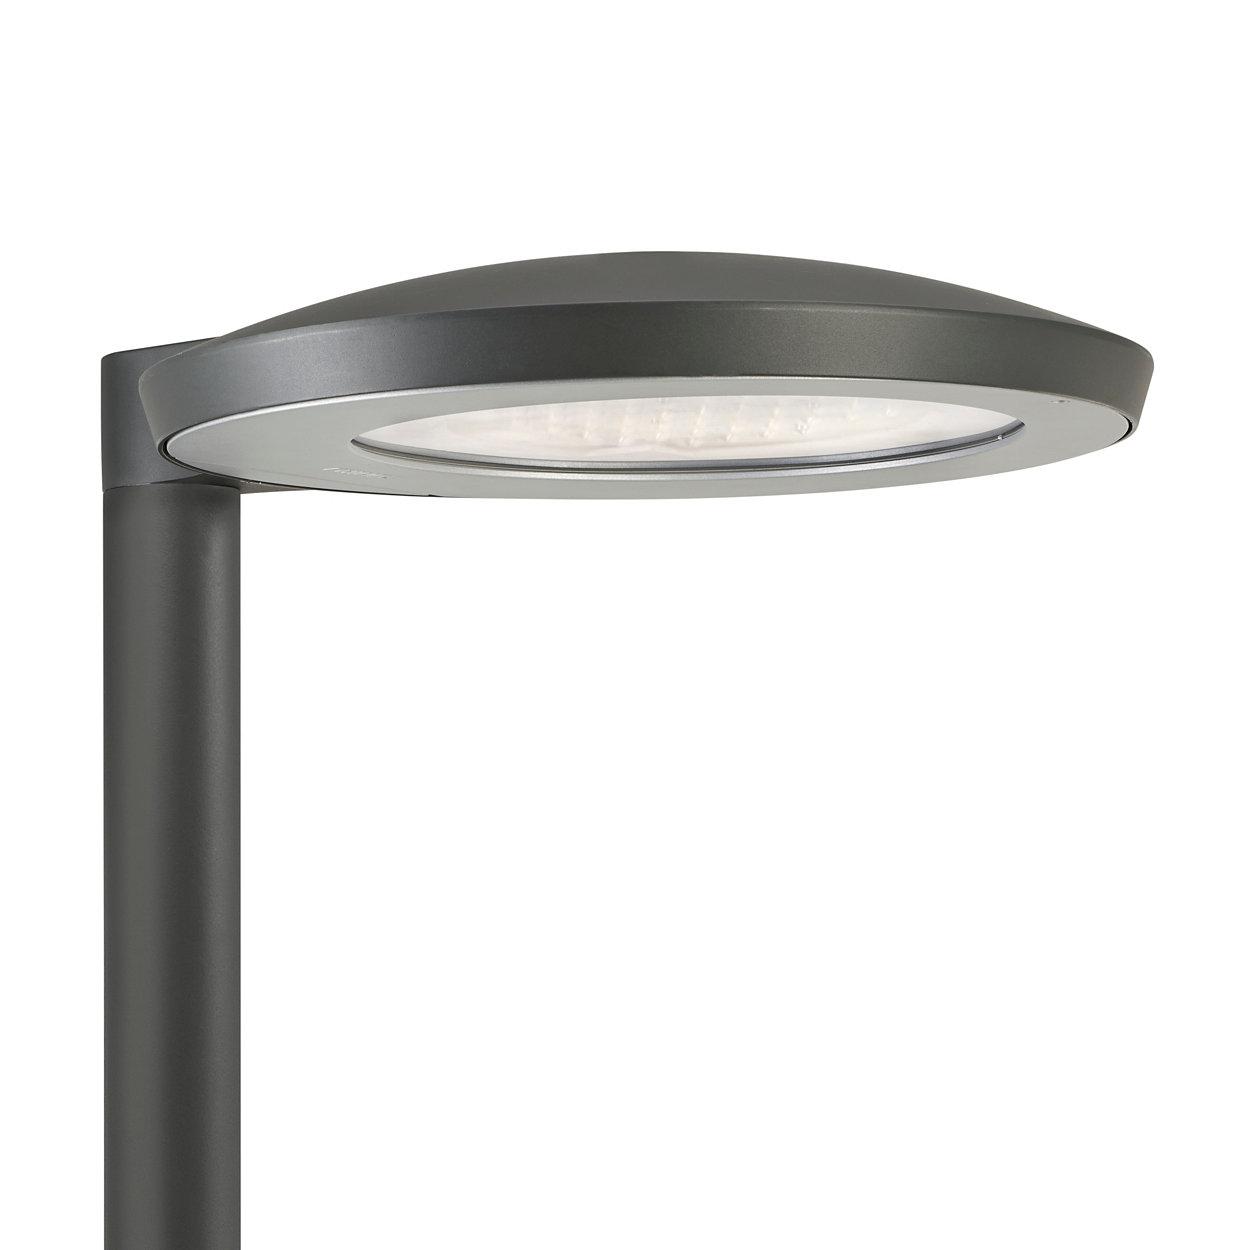 CitySoul gen2 LED – a versatile identity